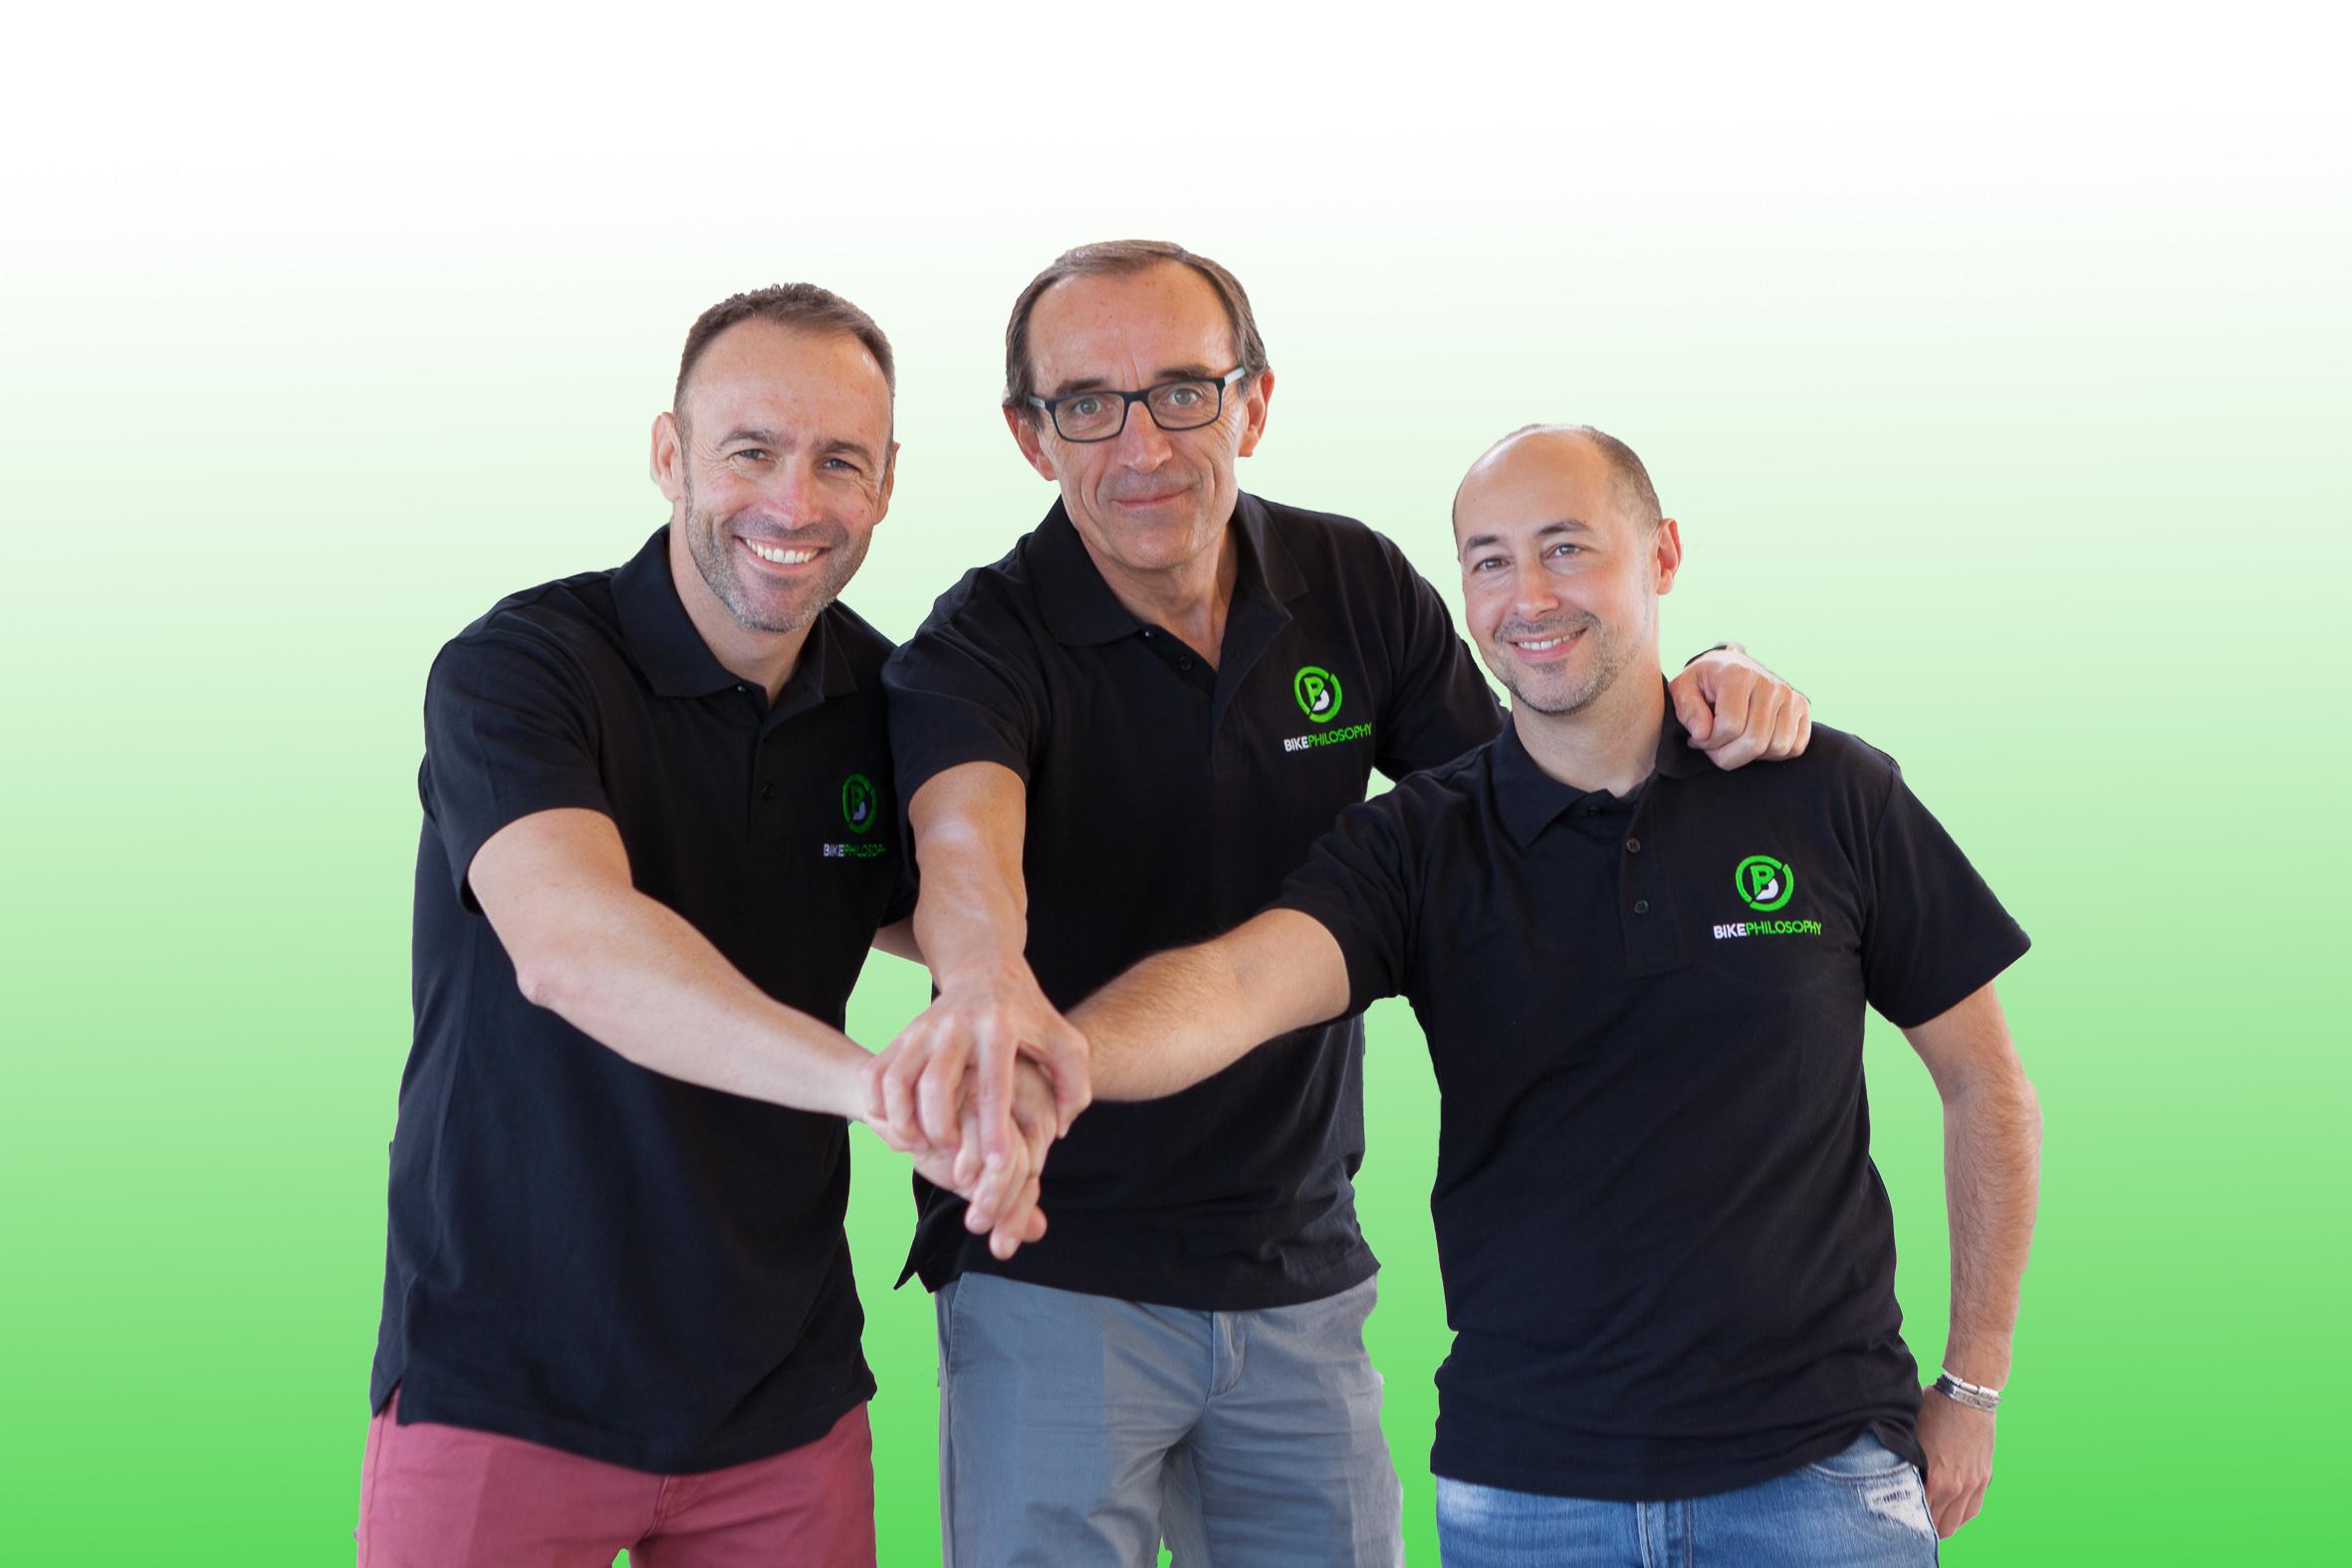 equipo Bikephilosophy